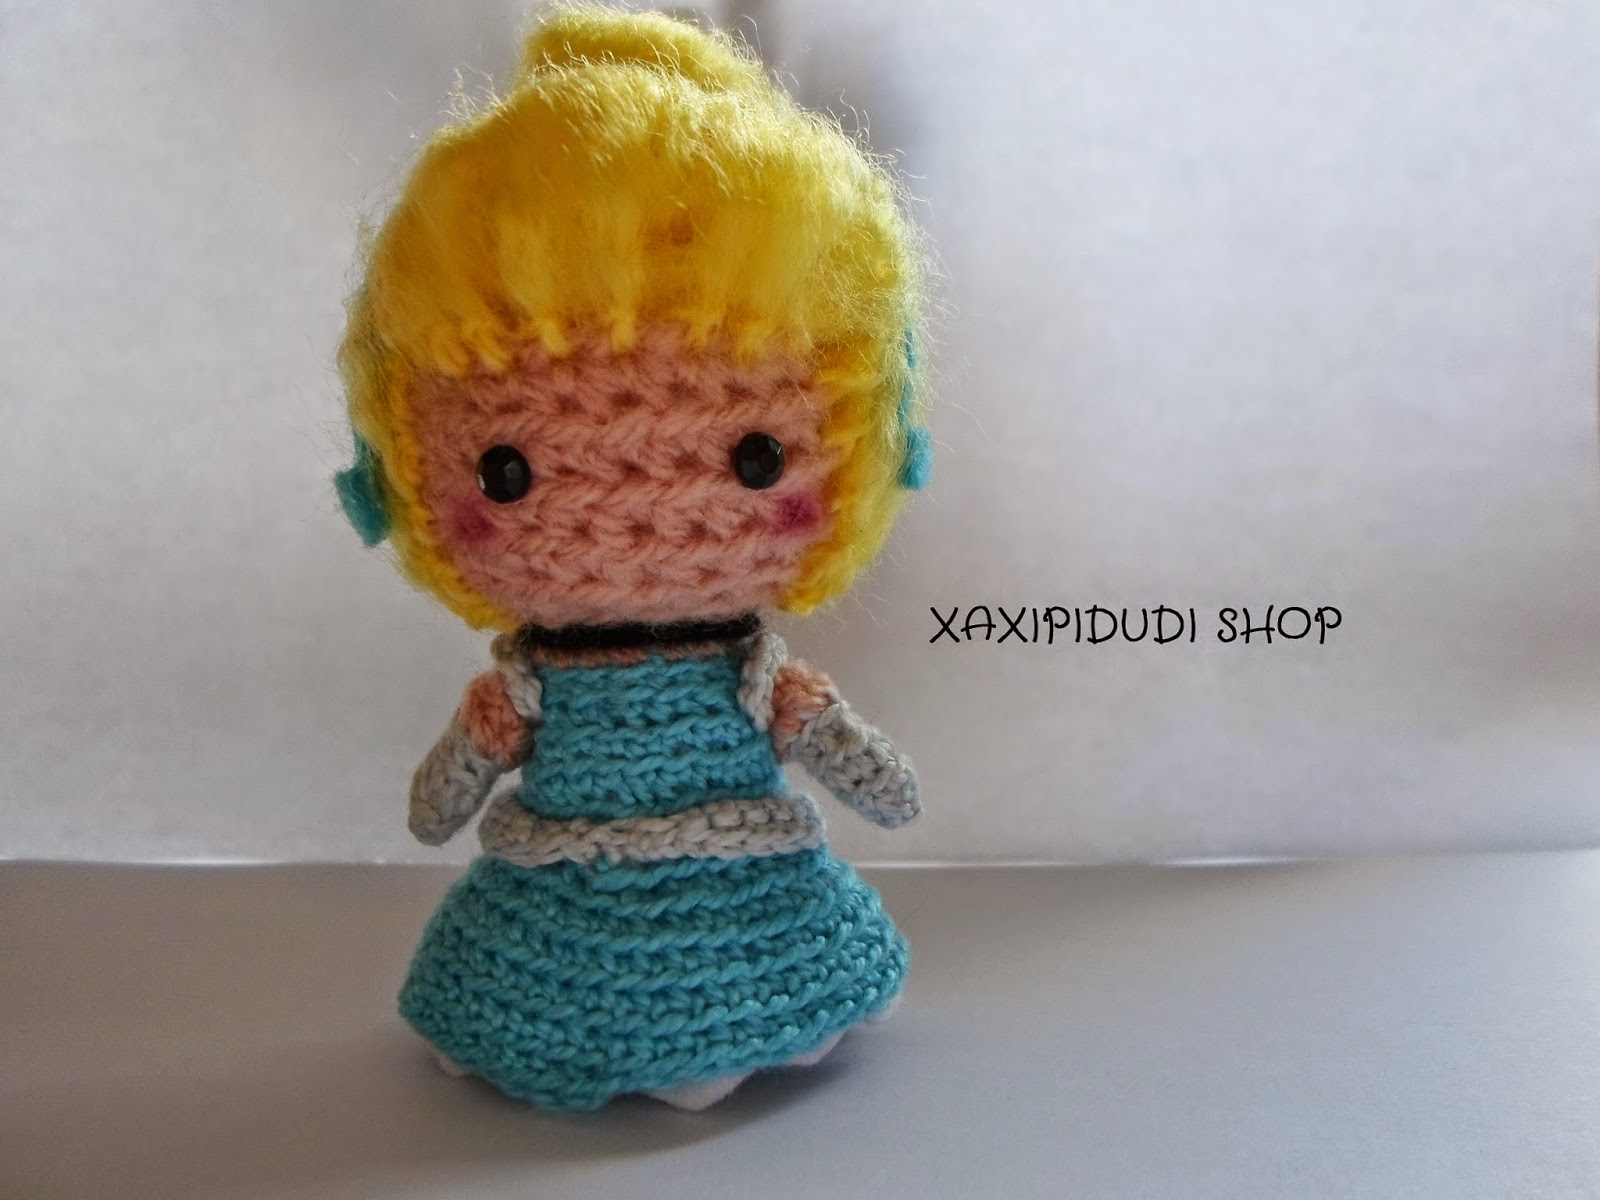 XAXIPIDUDI SHOP: Amigurumis y mucho mas.: AMIGURUMI ...